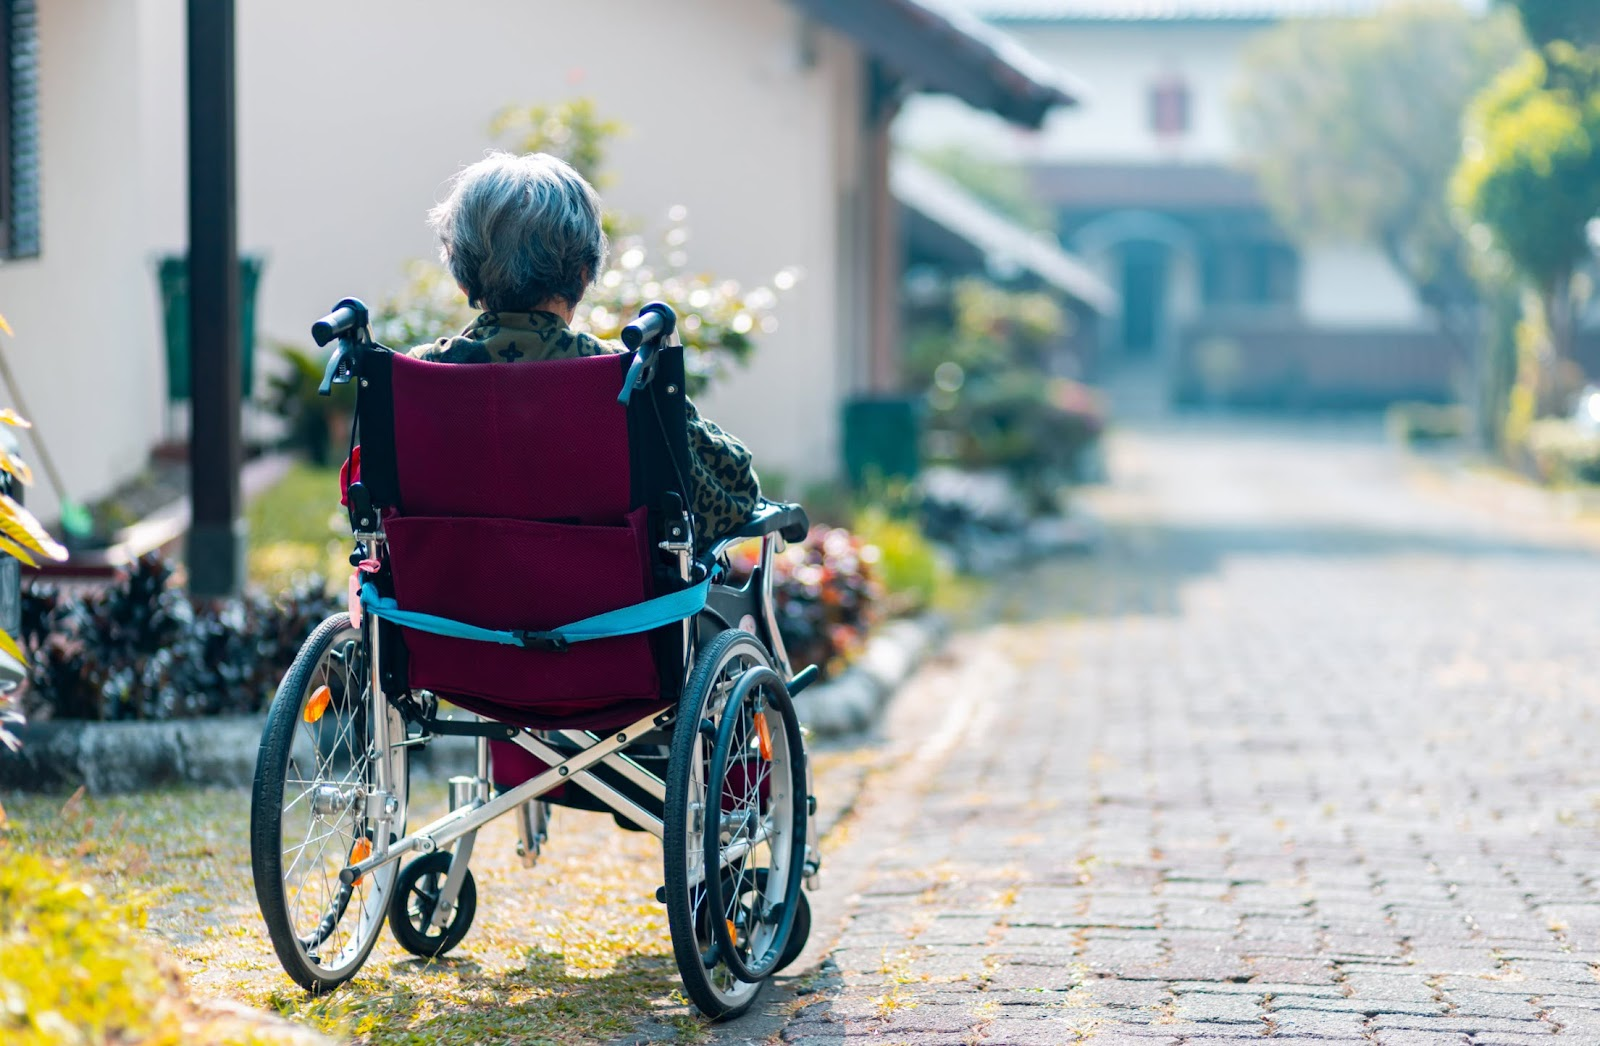 Alzheimer's disease (in-depth guide)